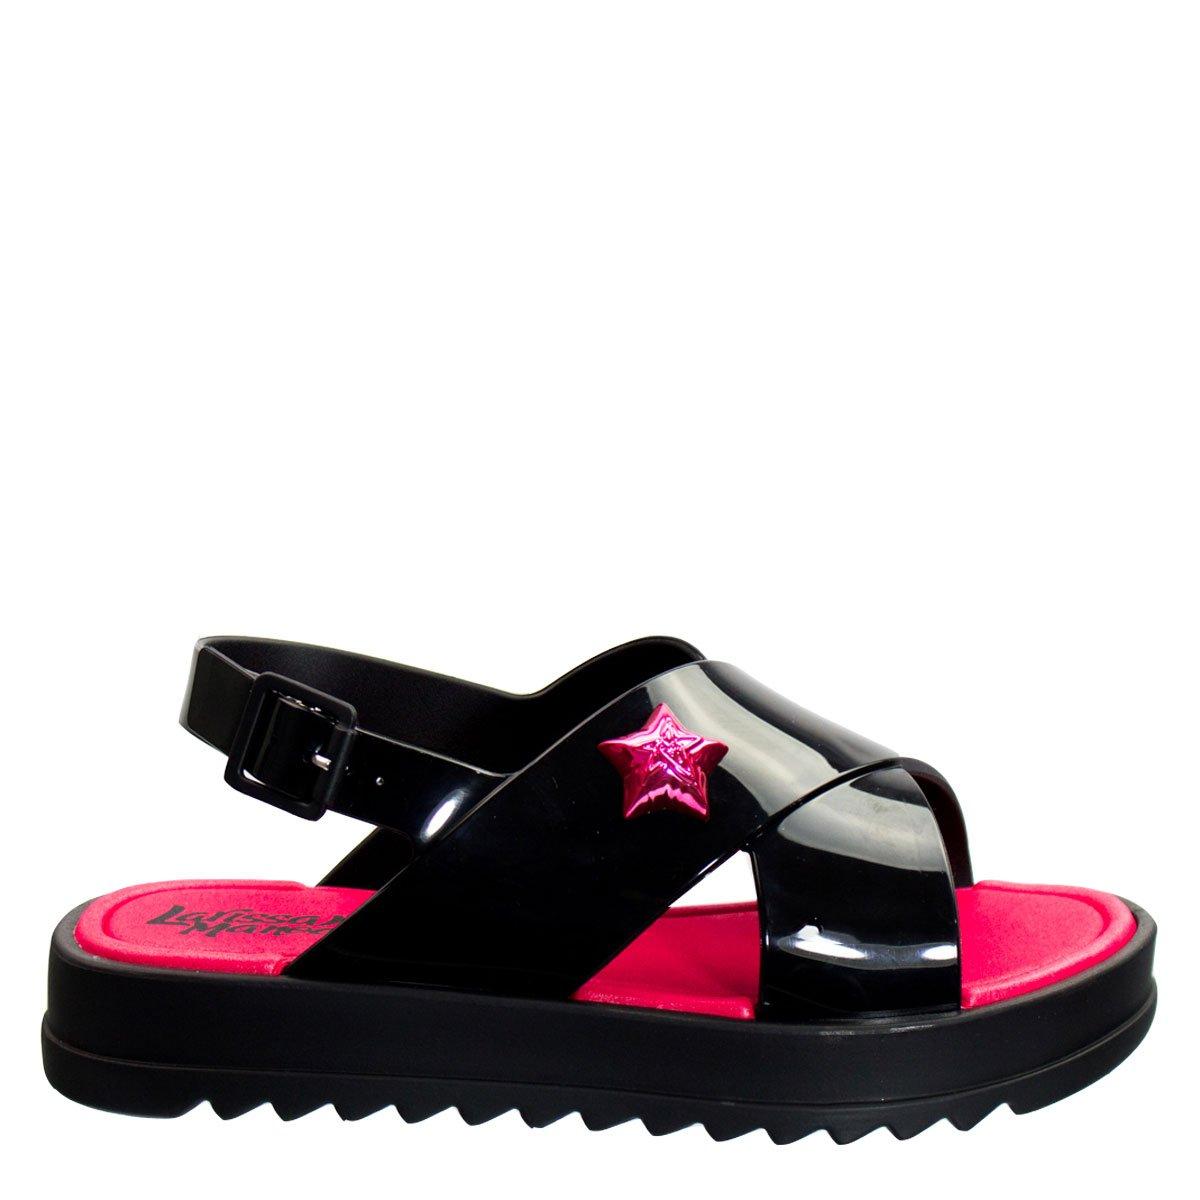 590369a48 Bizz Store - Sandália Flat Infantil Grendene Larissa Manoela